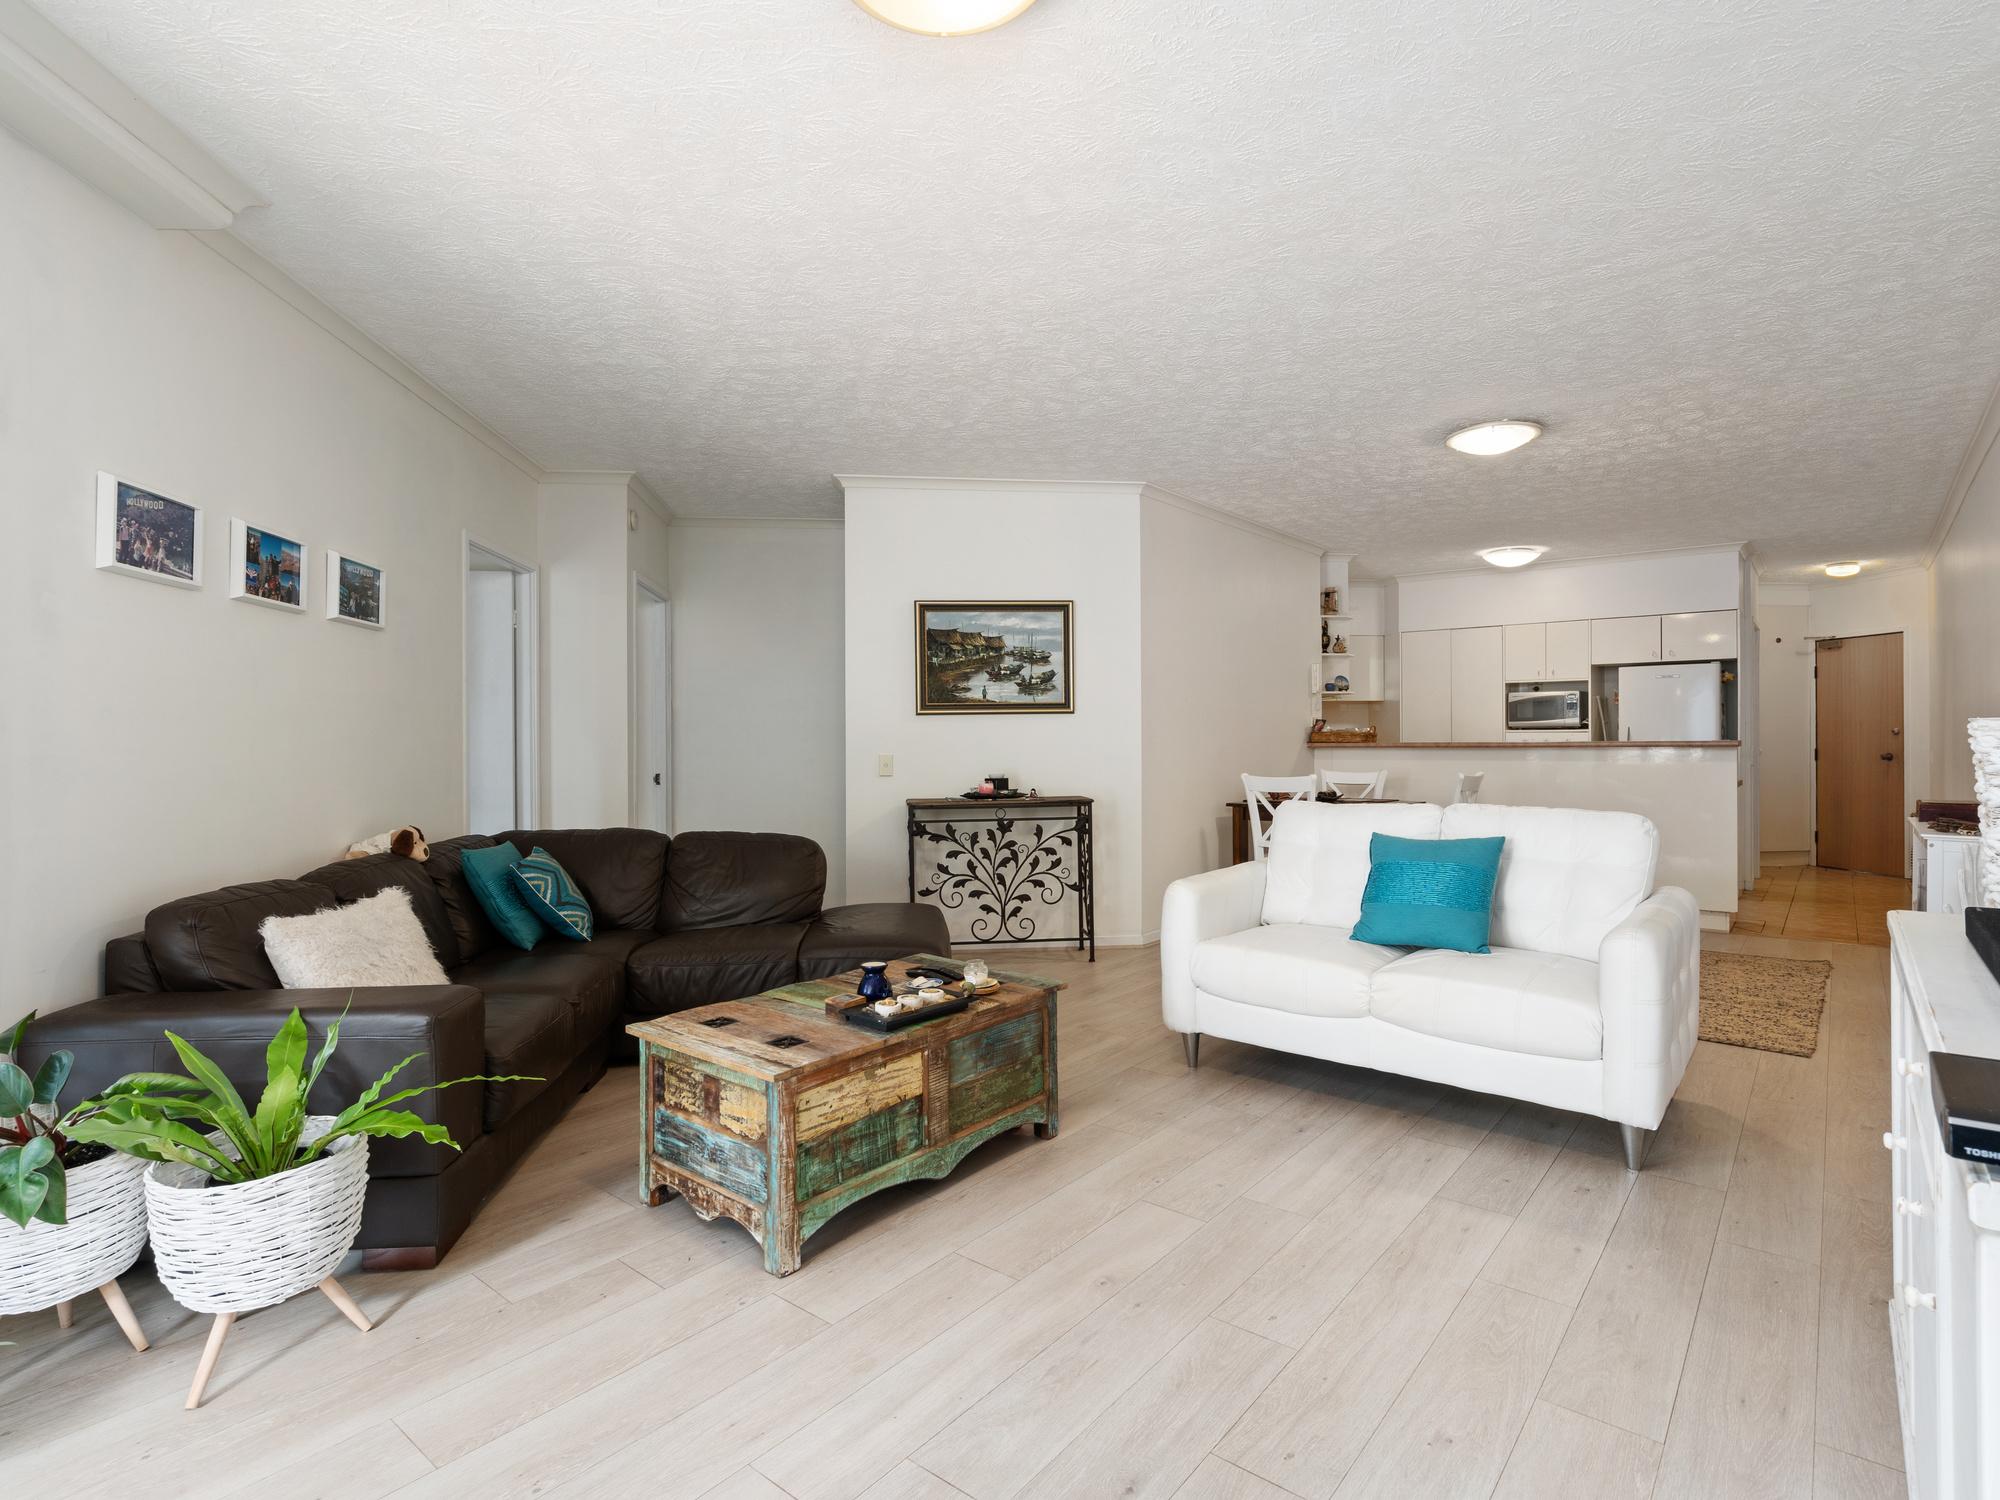 Real Estate | Gold Coast | Chevron Realty | 003 Open2view Id683962 3 10 16 Tarcoola Cresebt